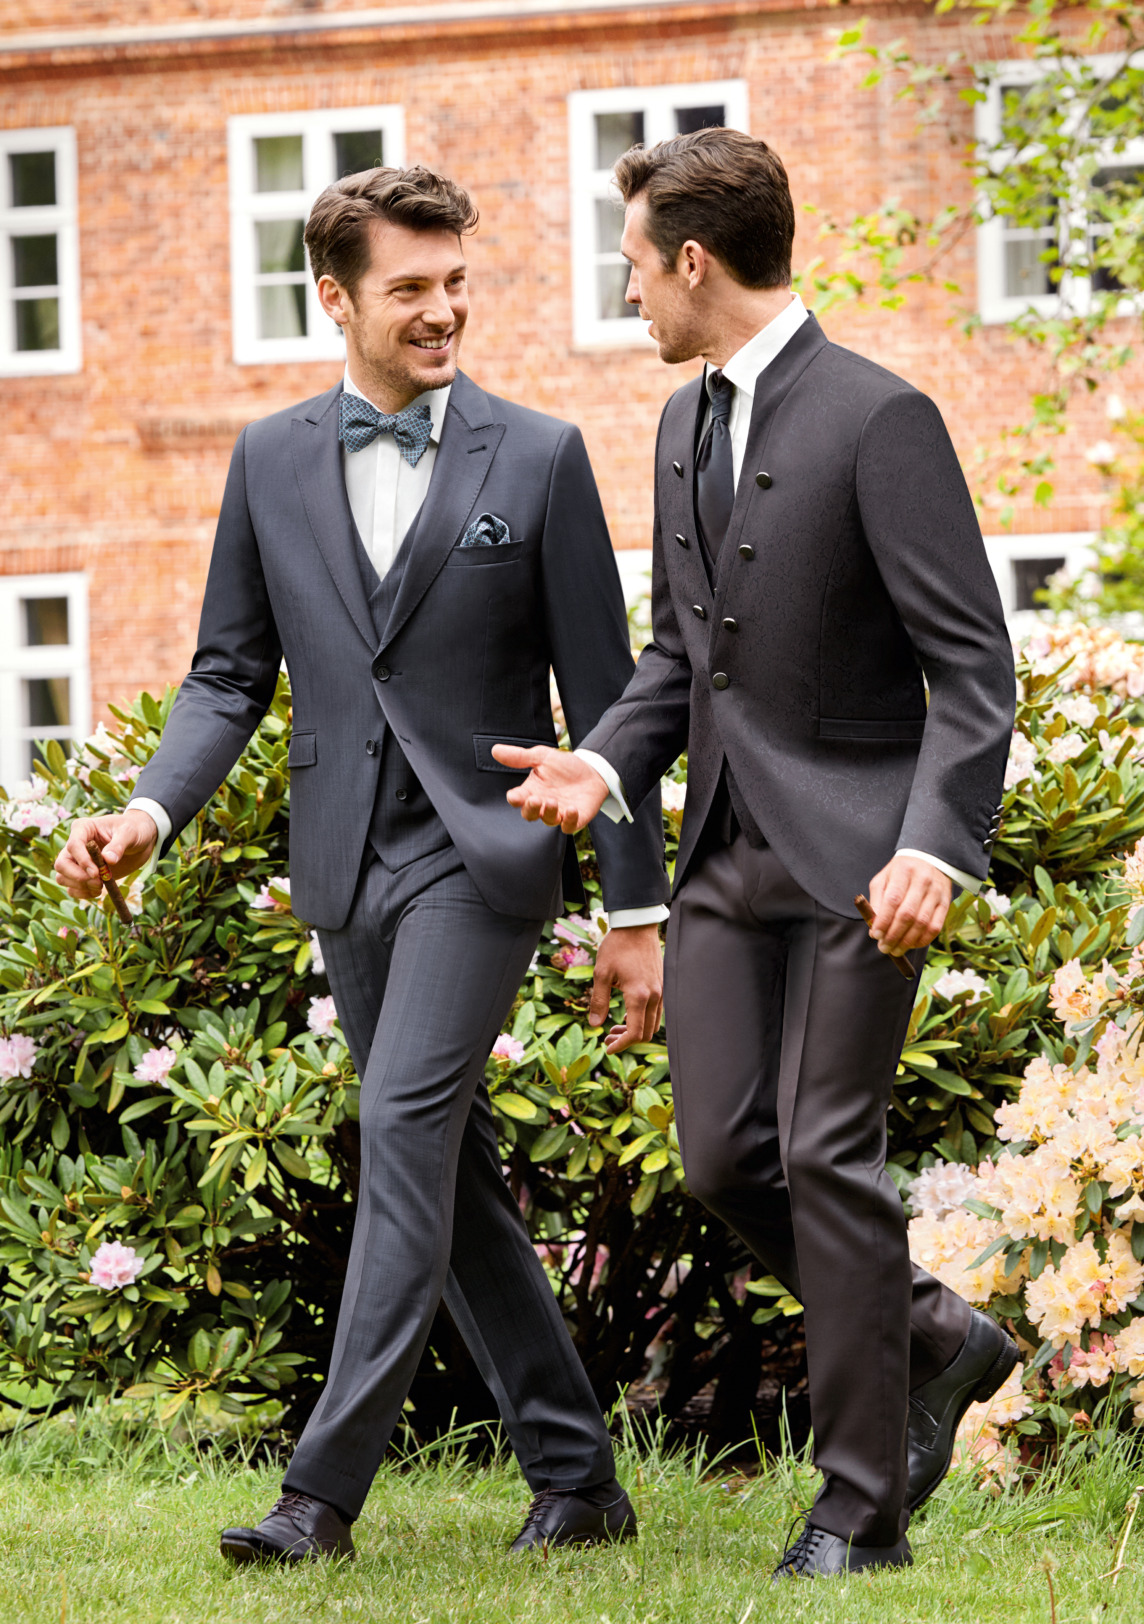 Wilvorst After Six Hochzeitsanzug Männer Mode Bräutigam klassische Form wil_0121_kam_as-look-5-look-6_1